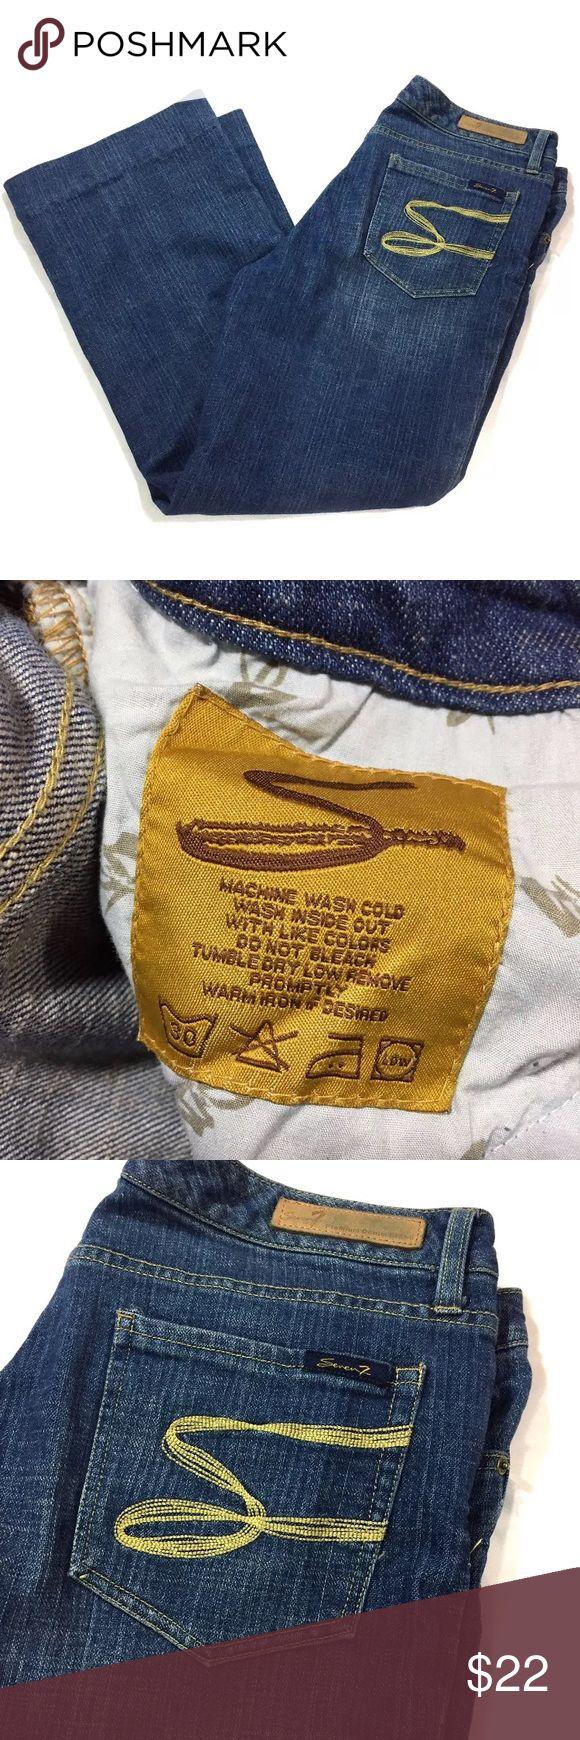 "Seven Jeans Flare Leg Jeans Size 14 Inseam 28"" Seven flare leg jeans size 14.  These have been hemmed to an inseam of 28"" as shown. Rise 10""  waist measured flat across 17"". Seven7 Jeans Flare & Wide Leg"